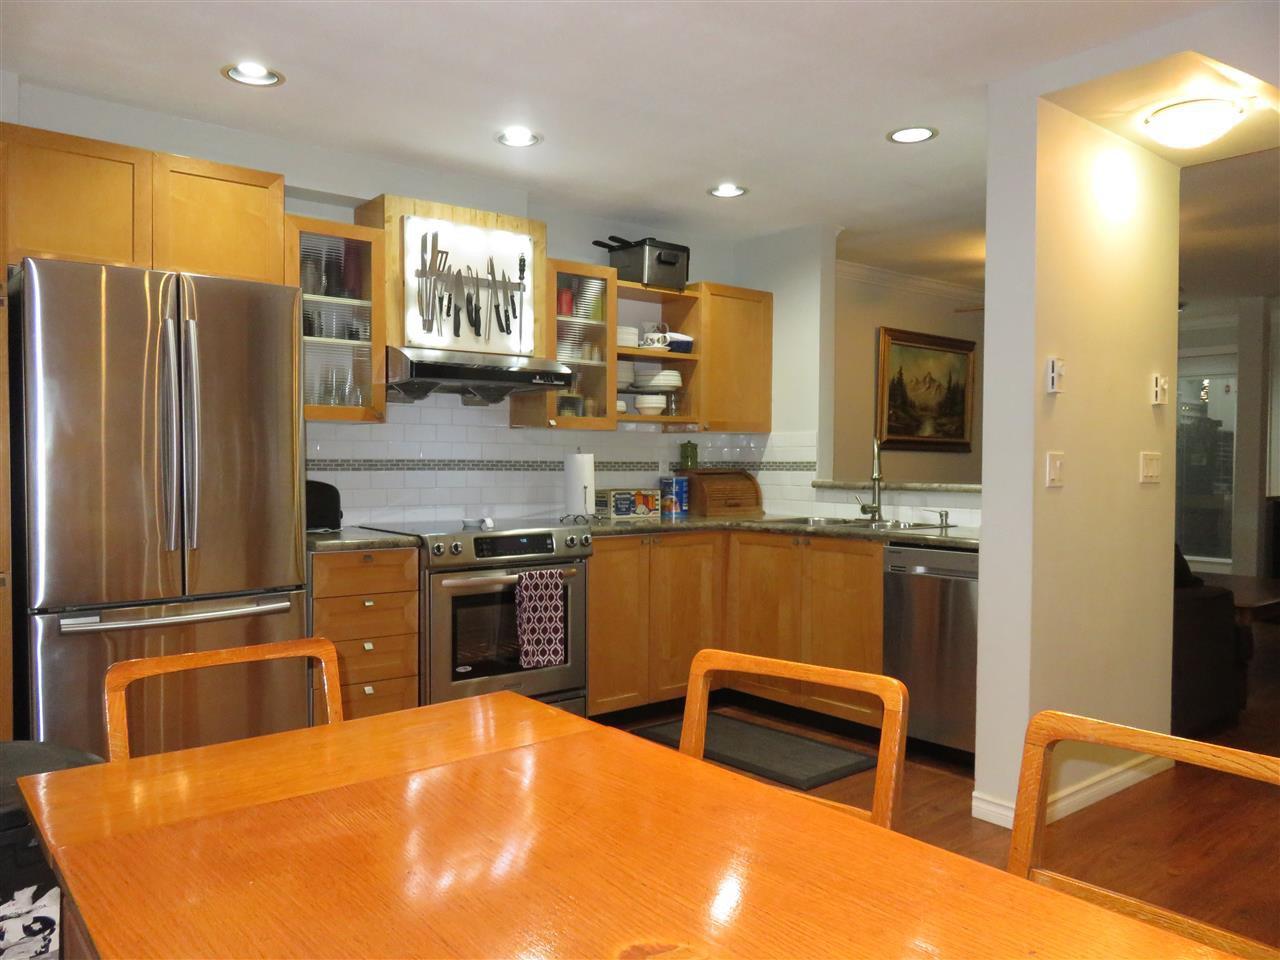 Large kitchen, new S/S appliances, new laminate